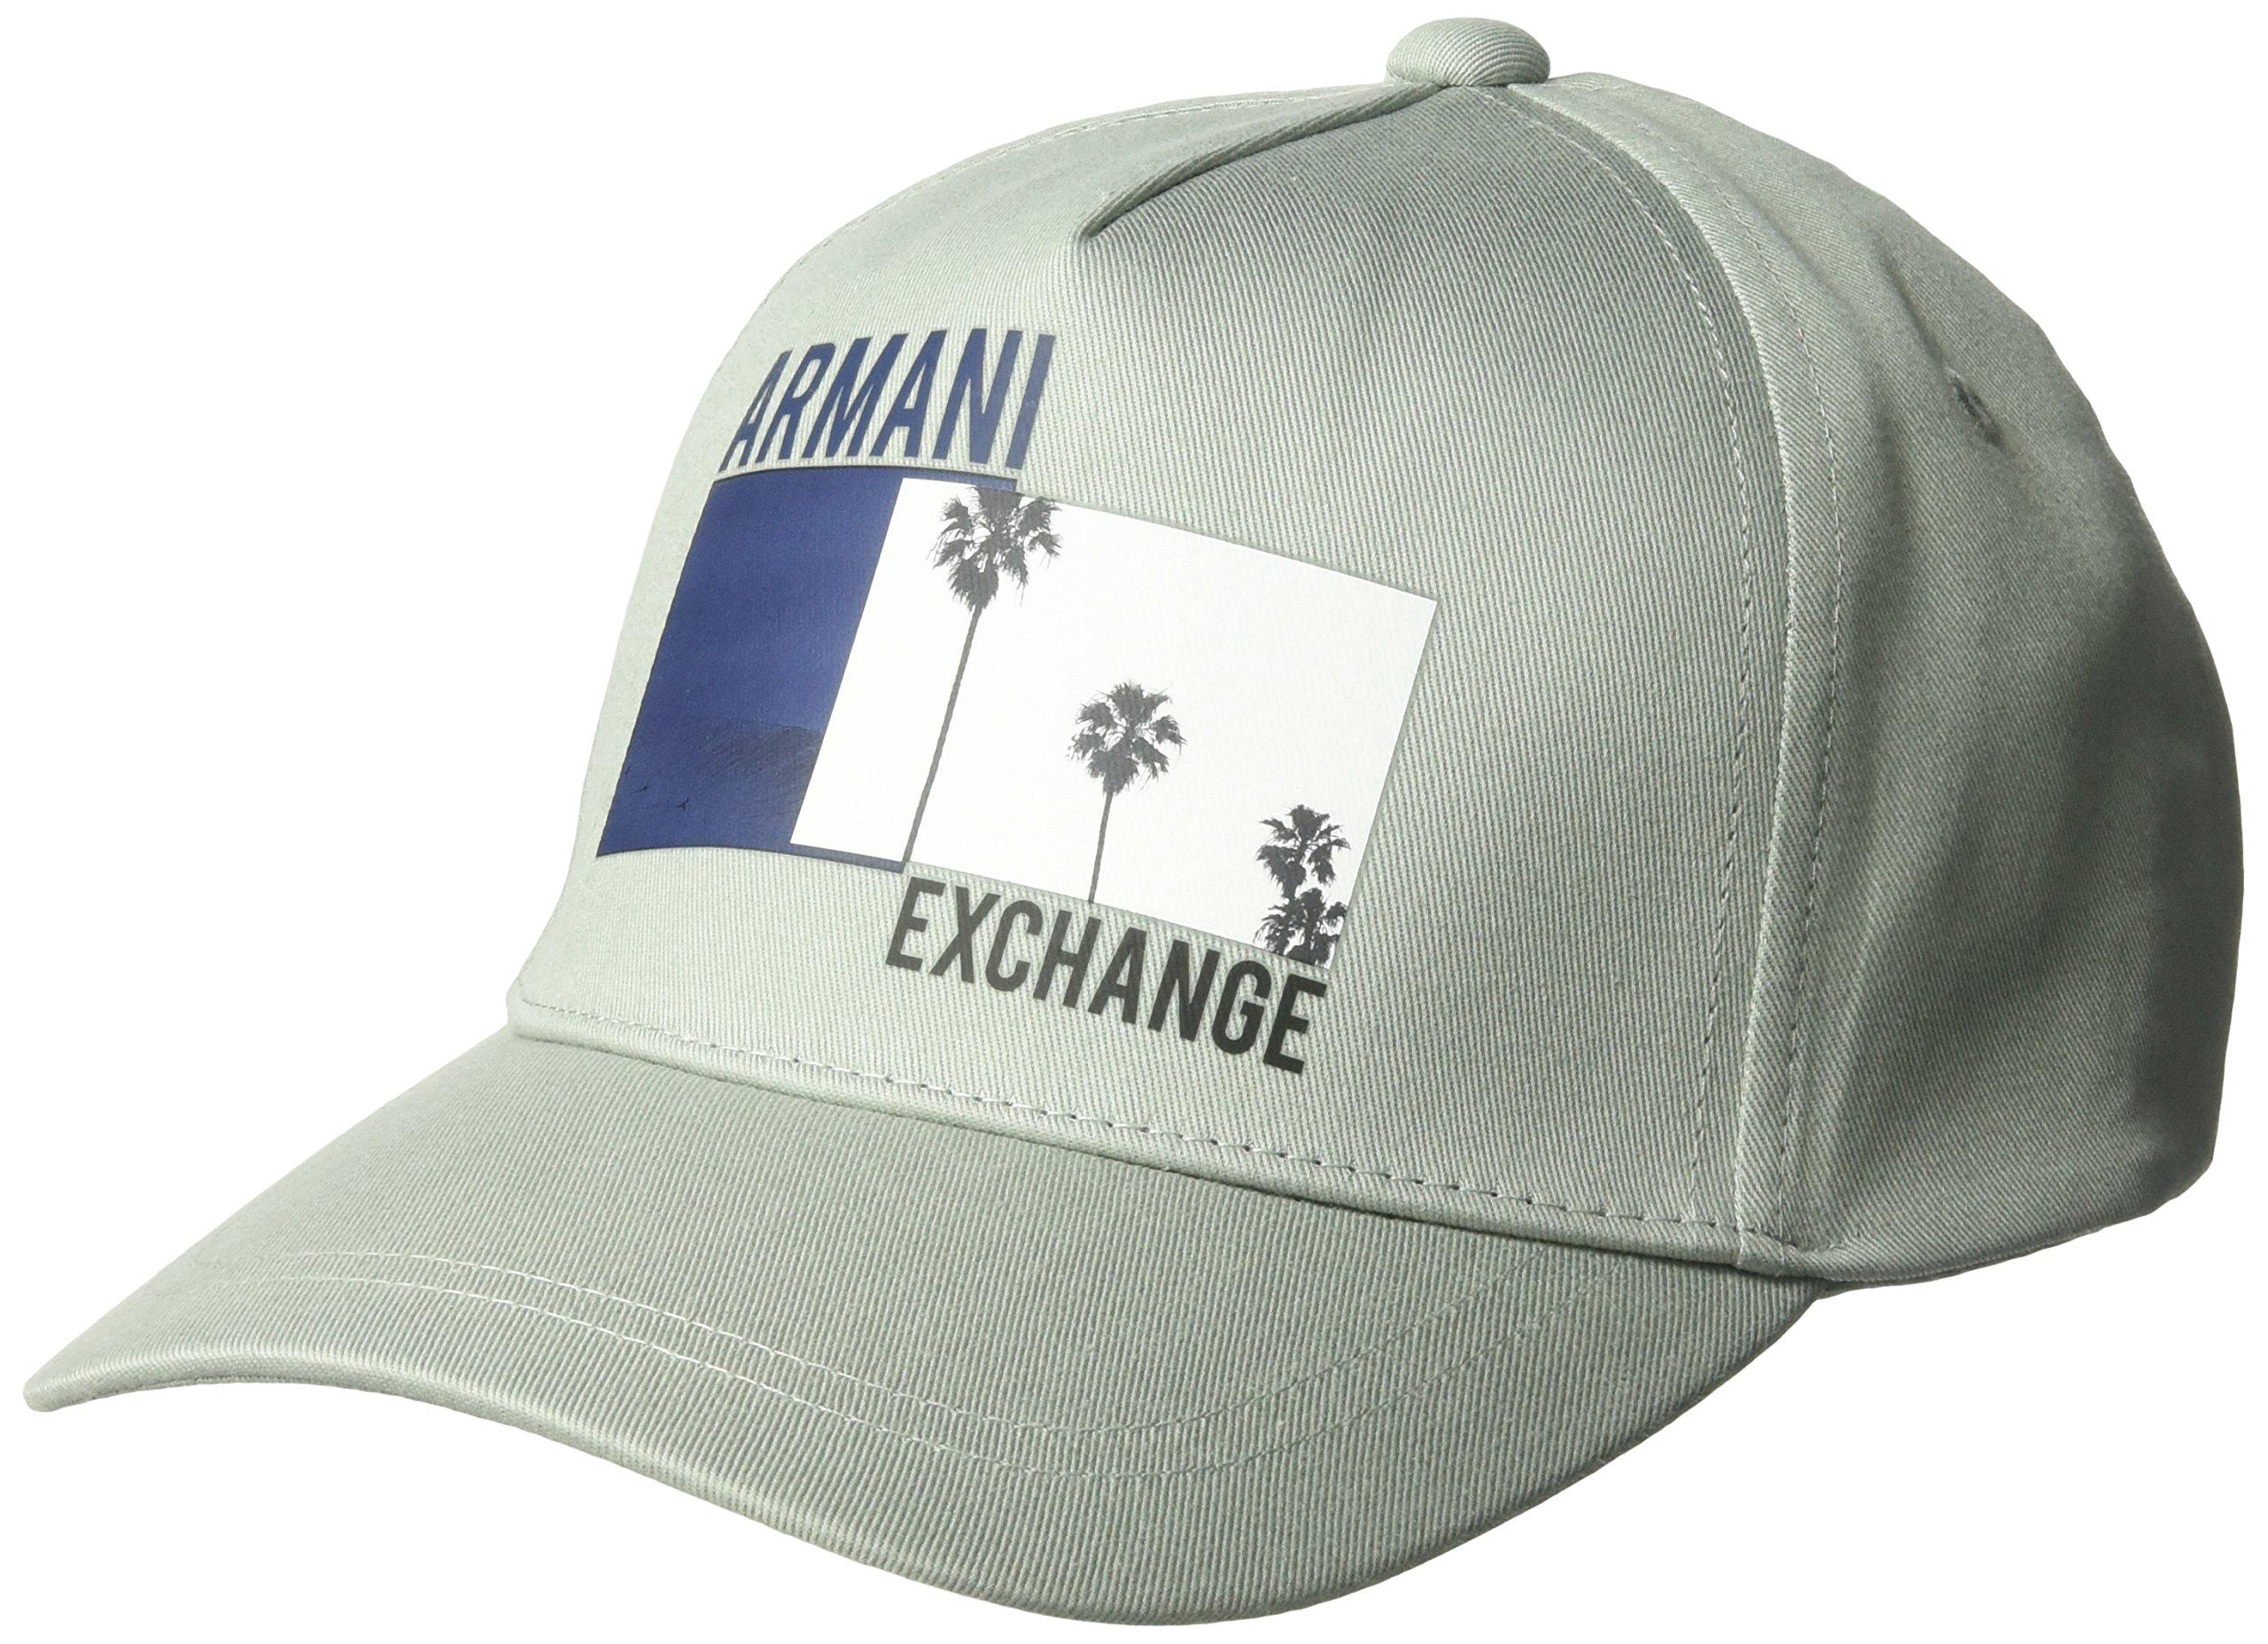 Armani Exchange Men's Endless Summer Cap, Wrought Iron, TU